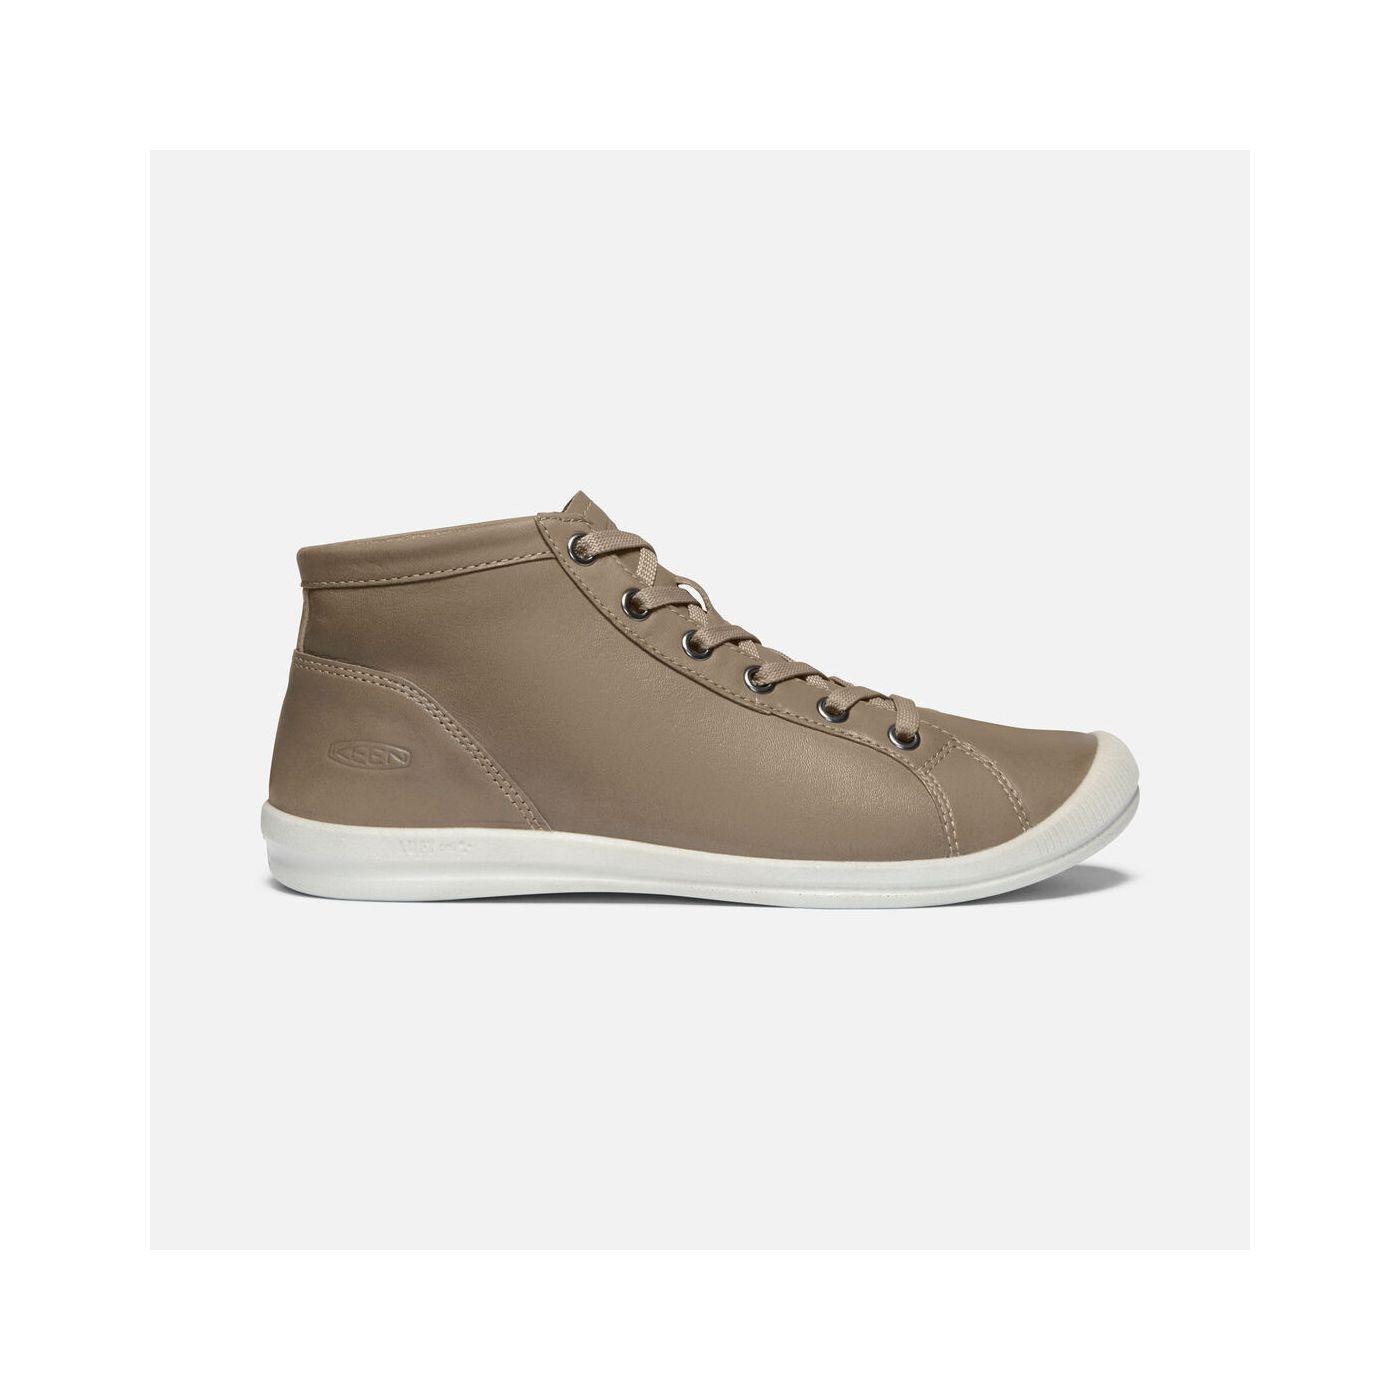 Women's sneakers KEEN LORELAI CHUKKA W